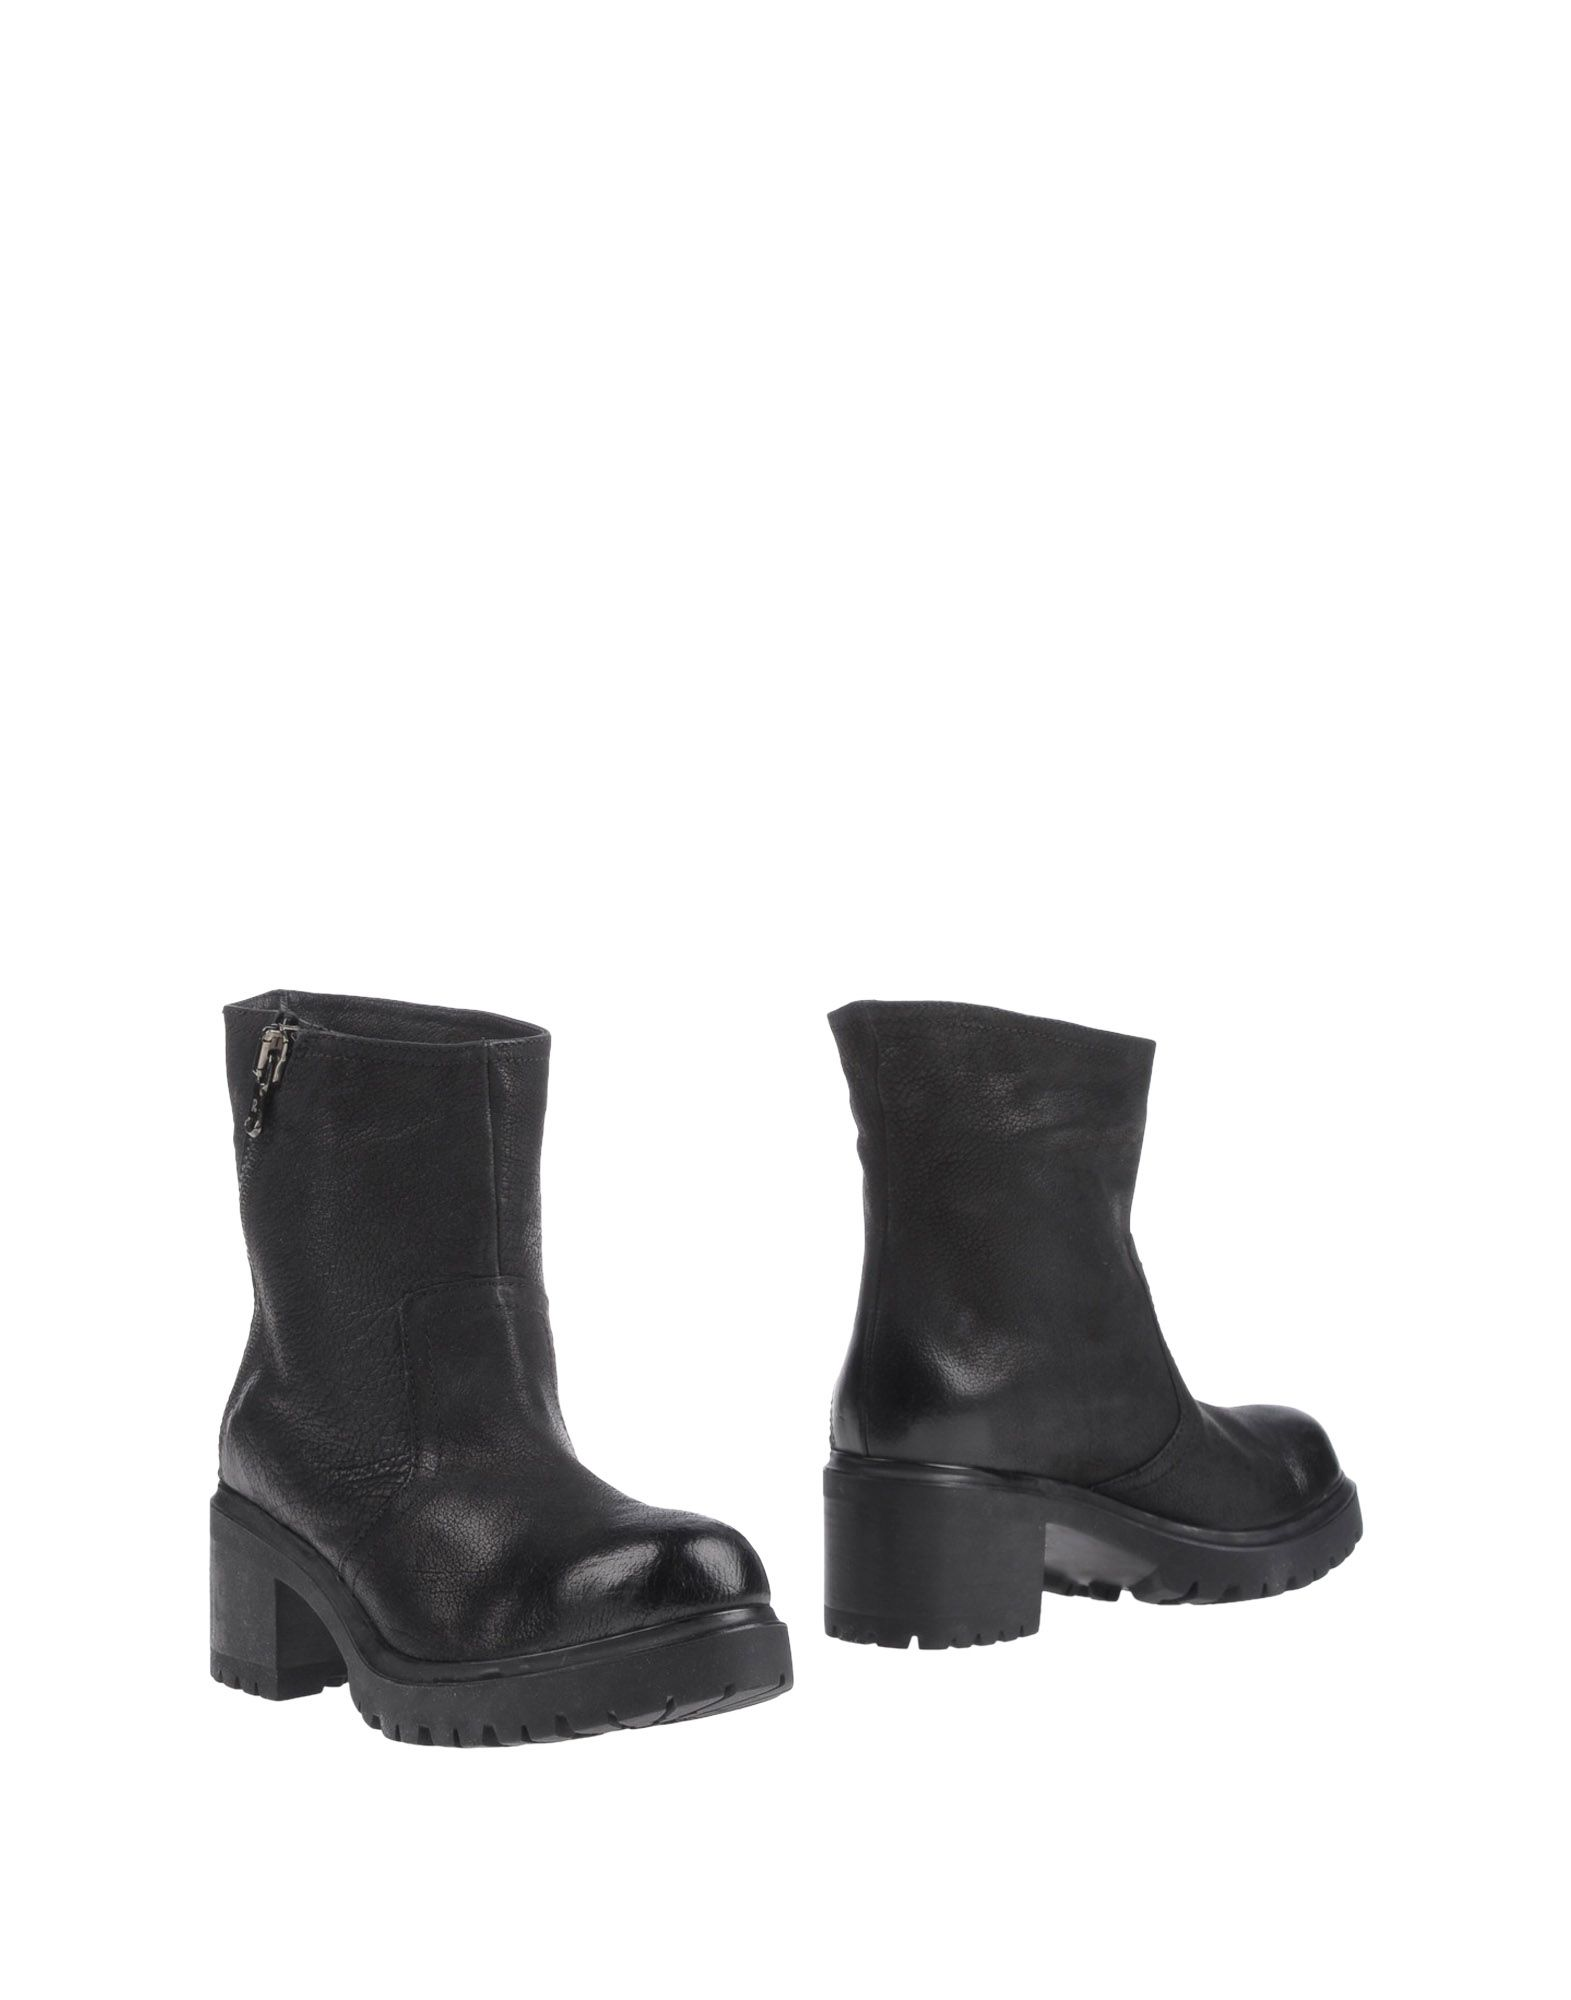 Paola Ferri Stiefelette Damen  11208830JK Gute Qualität beliebte Schuhe